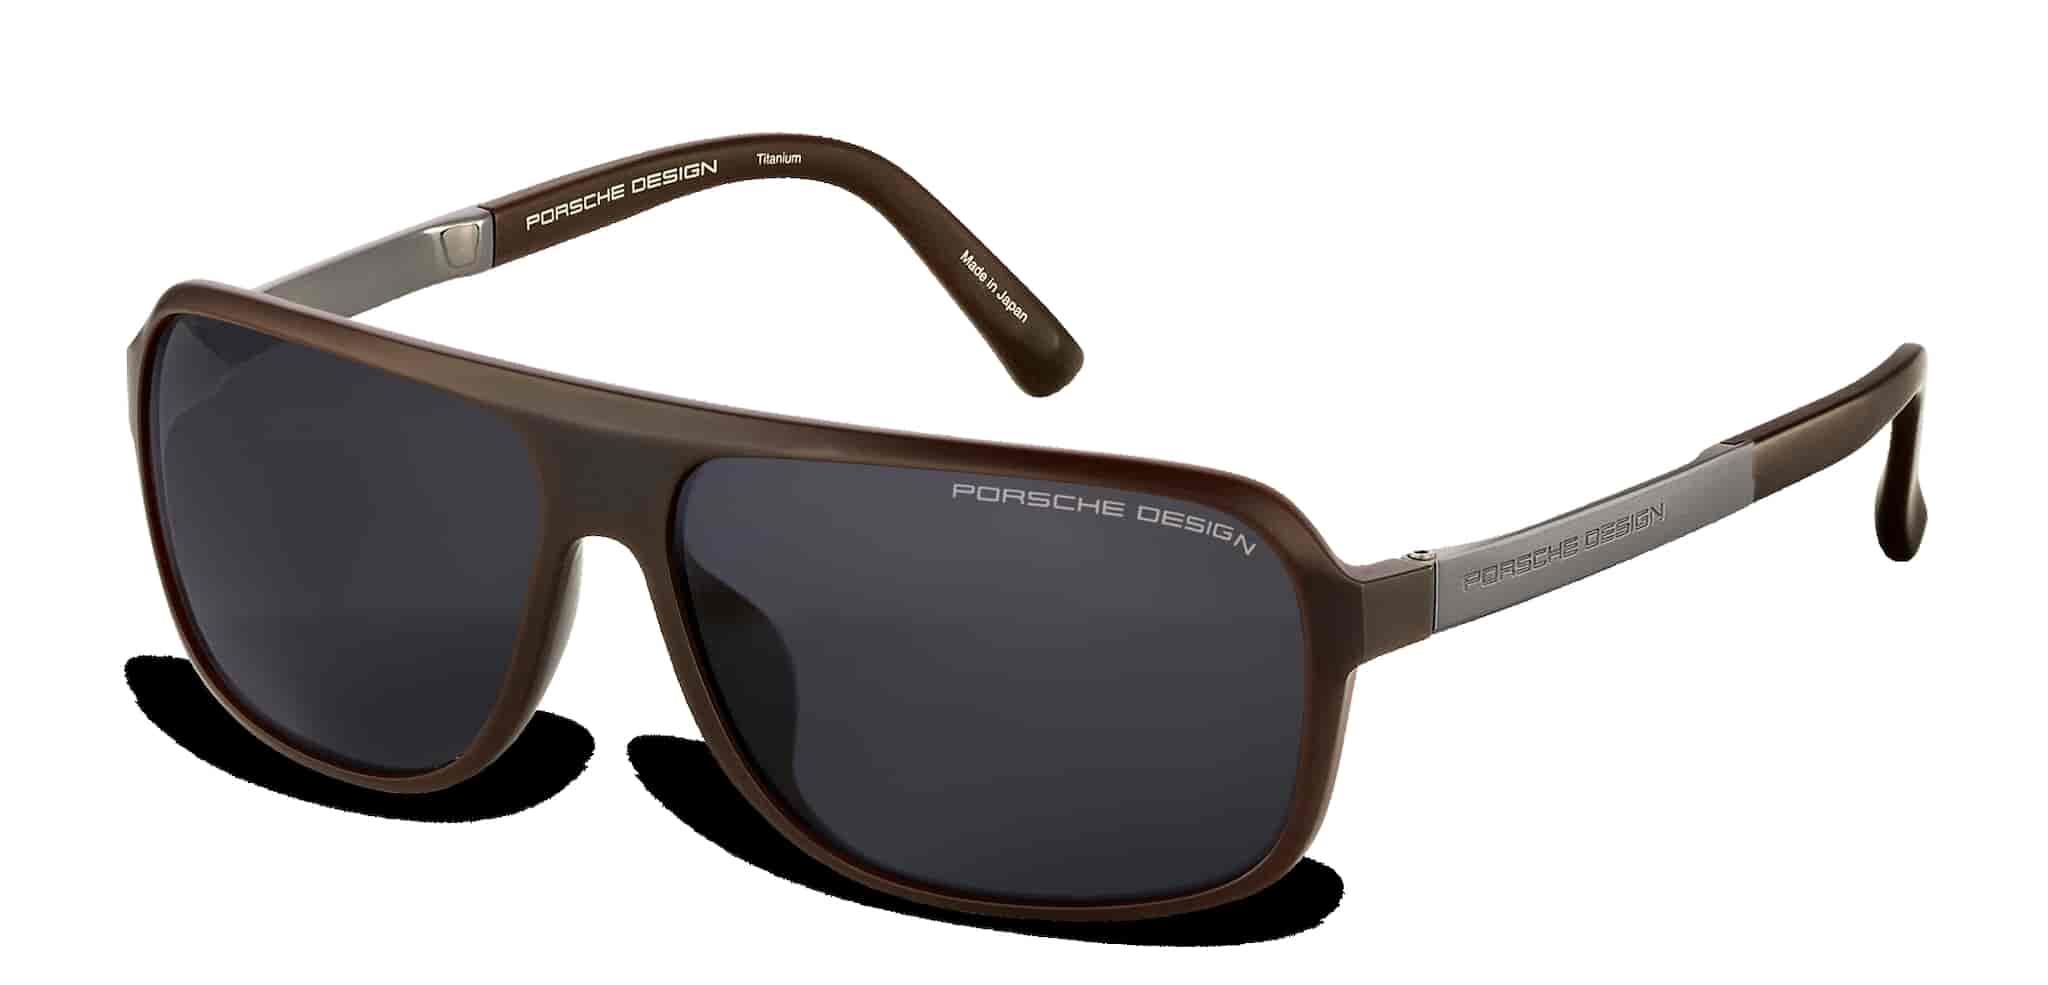 Porsche Design Sunglasses The Best Sunglasses